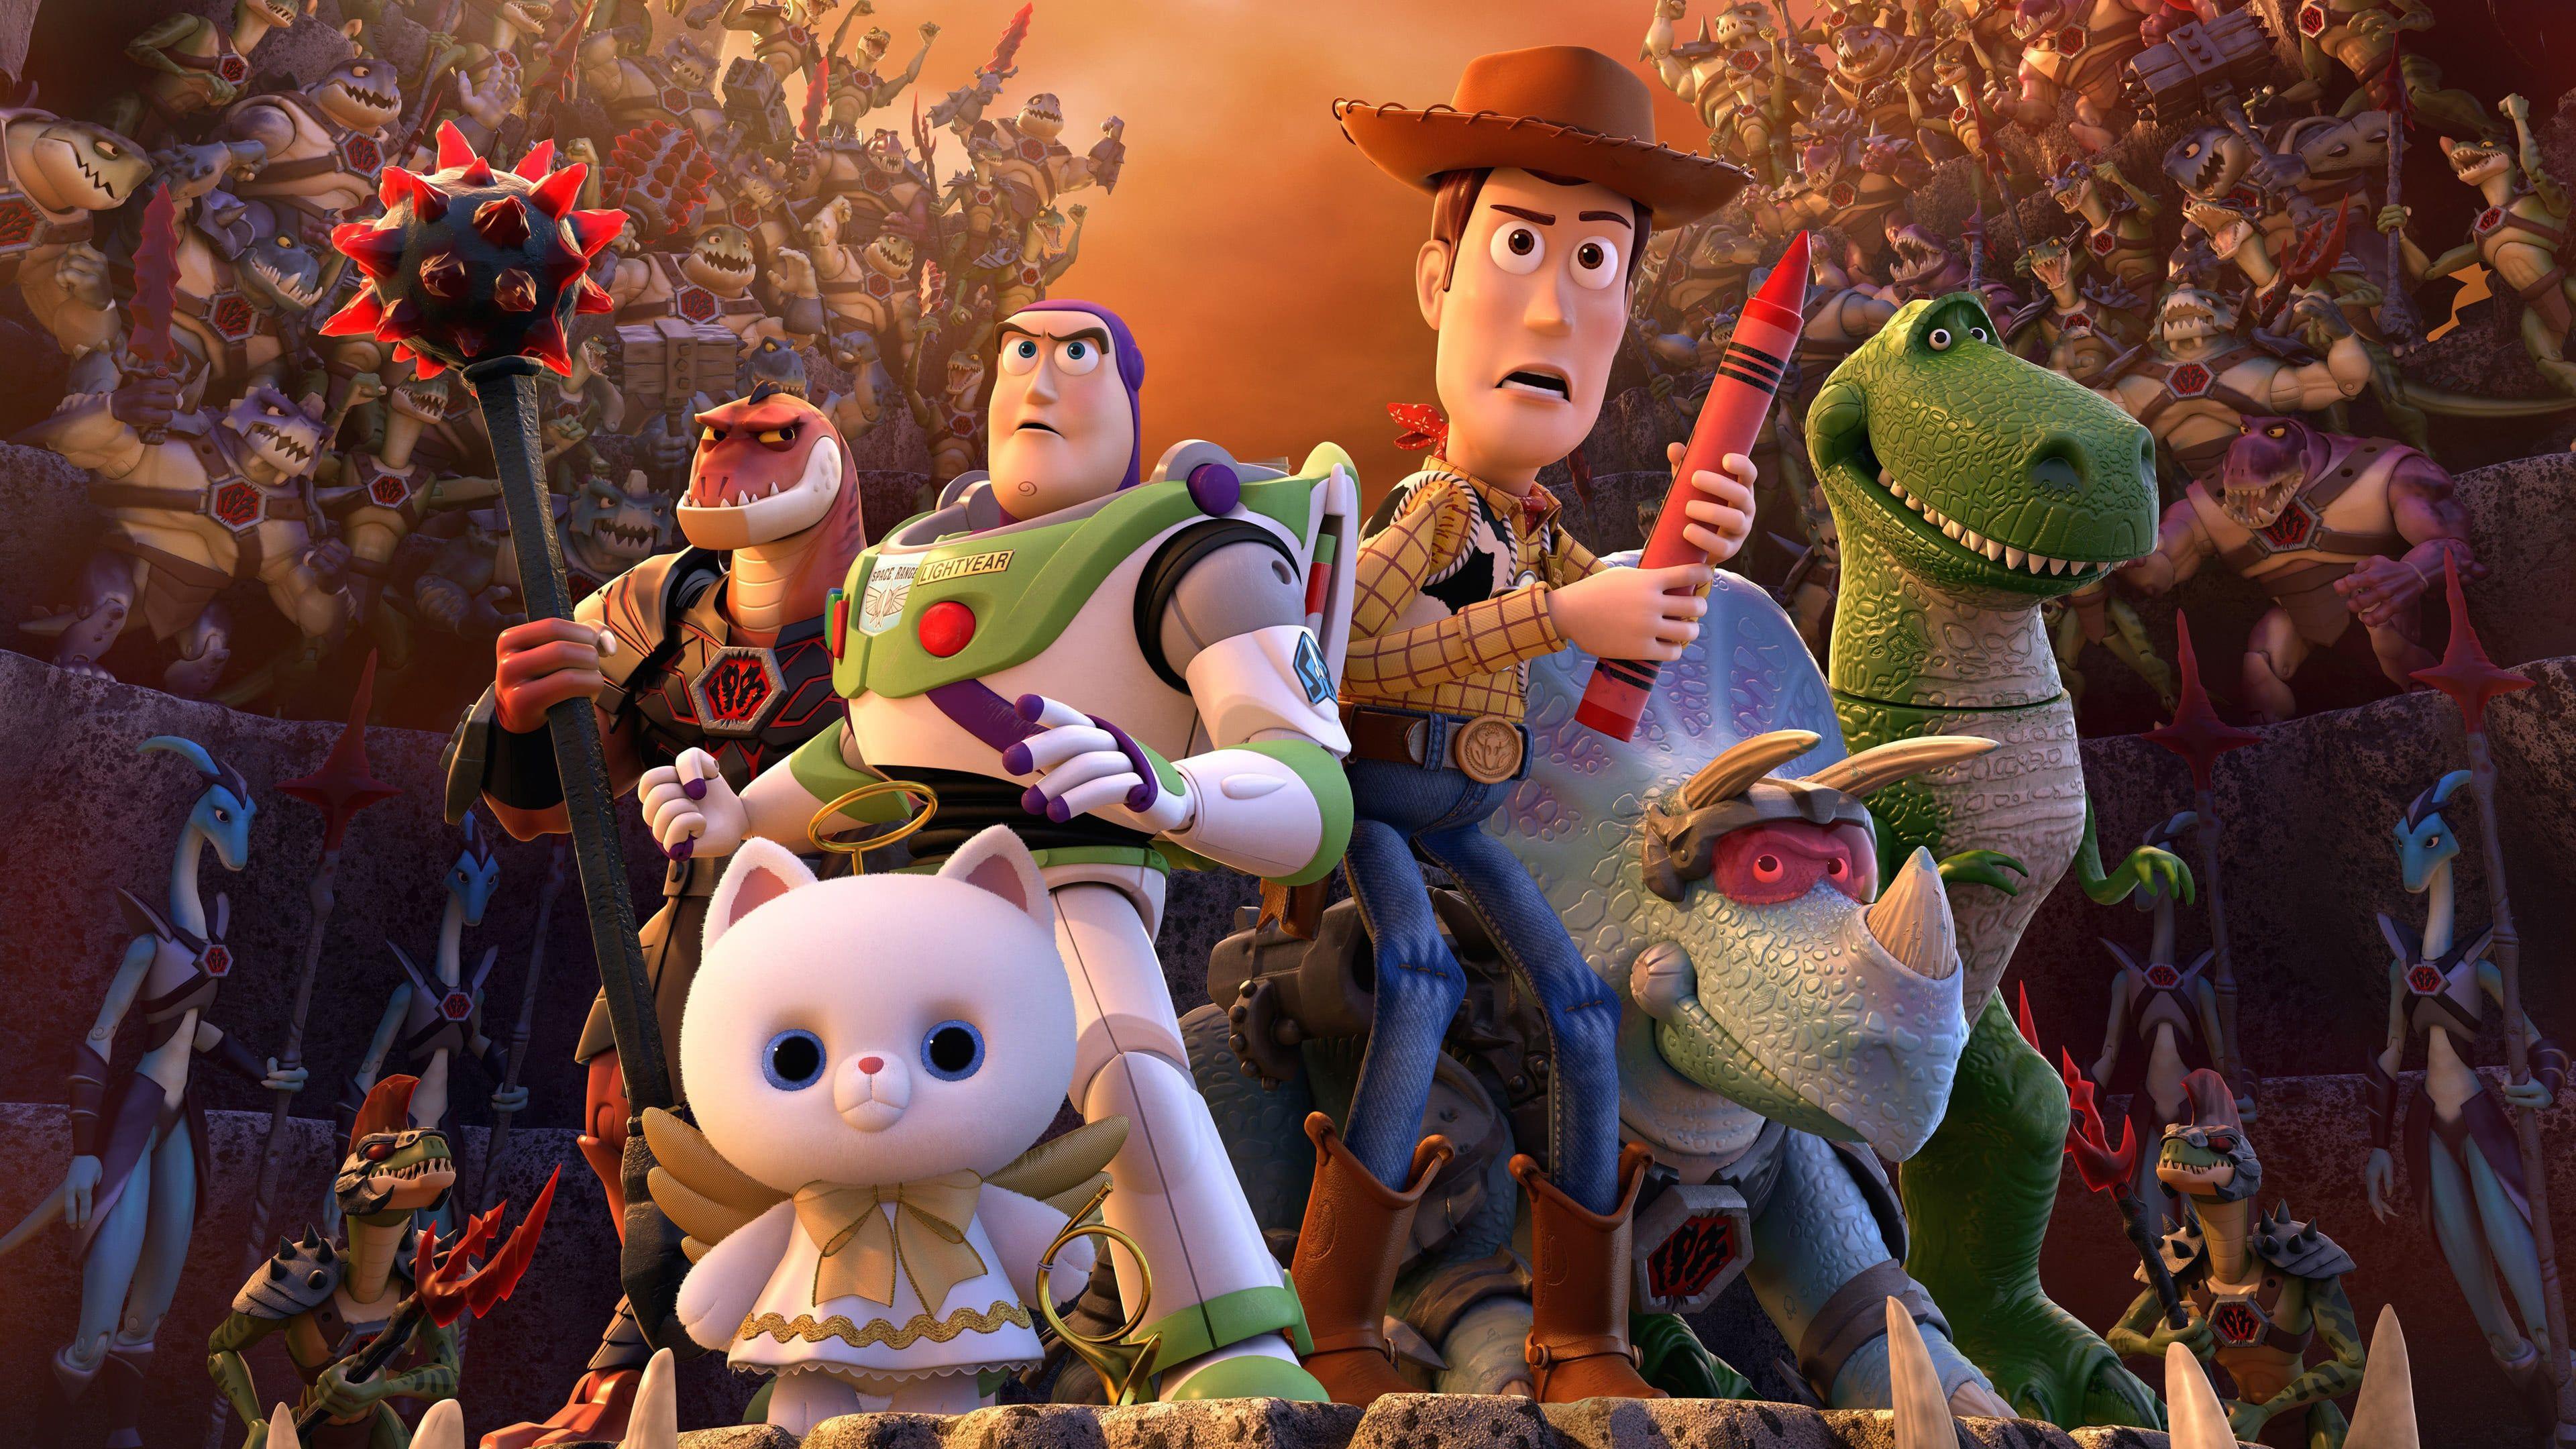 Halloween 2020 Pelicula Completa En EspañOl Latino Cinemitas ทอย สตอรี่ 4 (Toy Story 4) 2019 เต็มเรื่อง พากย์ไทย [ BLURAY in